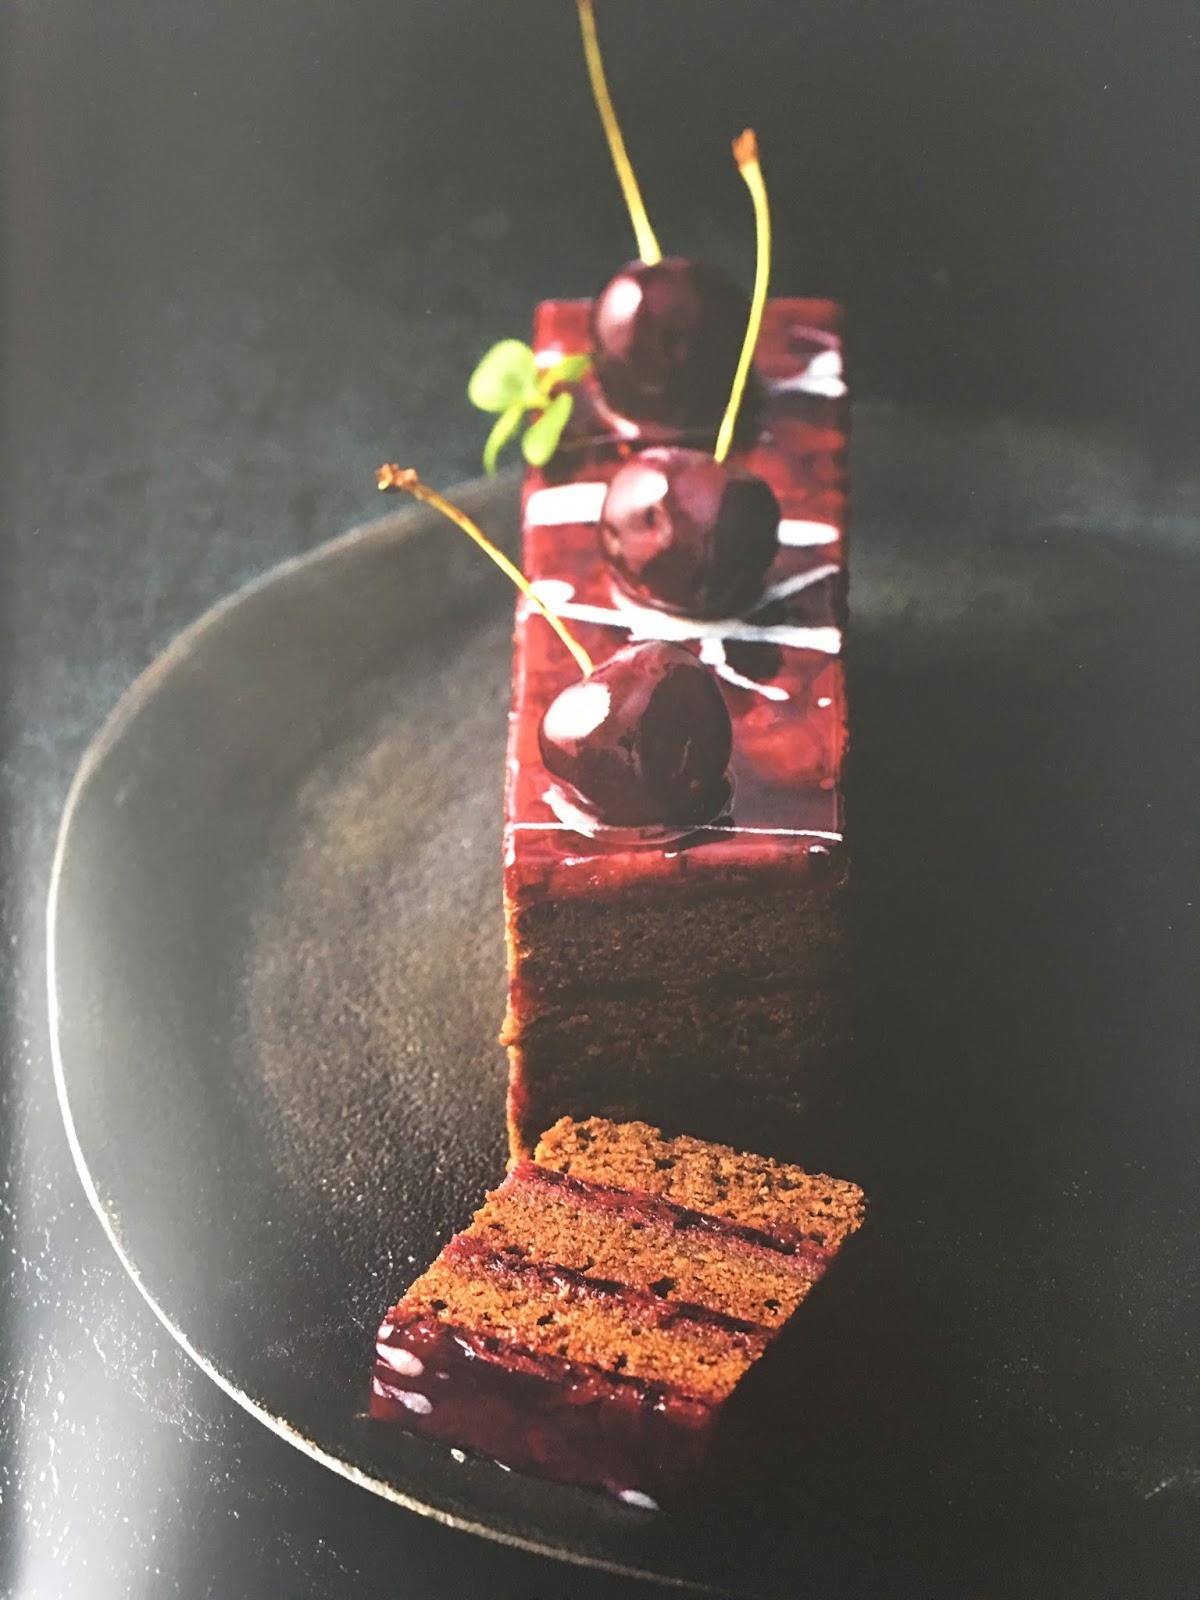 Cake Sale Au Aubergine Chevre Et Tomate S Ef Bf Bdch Ef Bf Bd